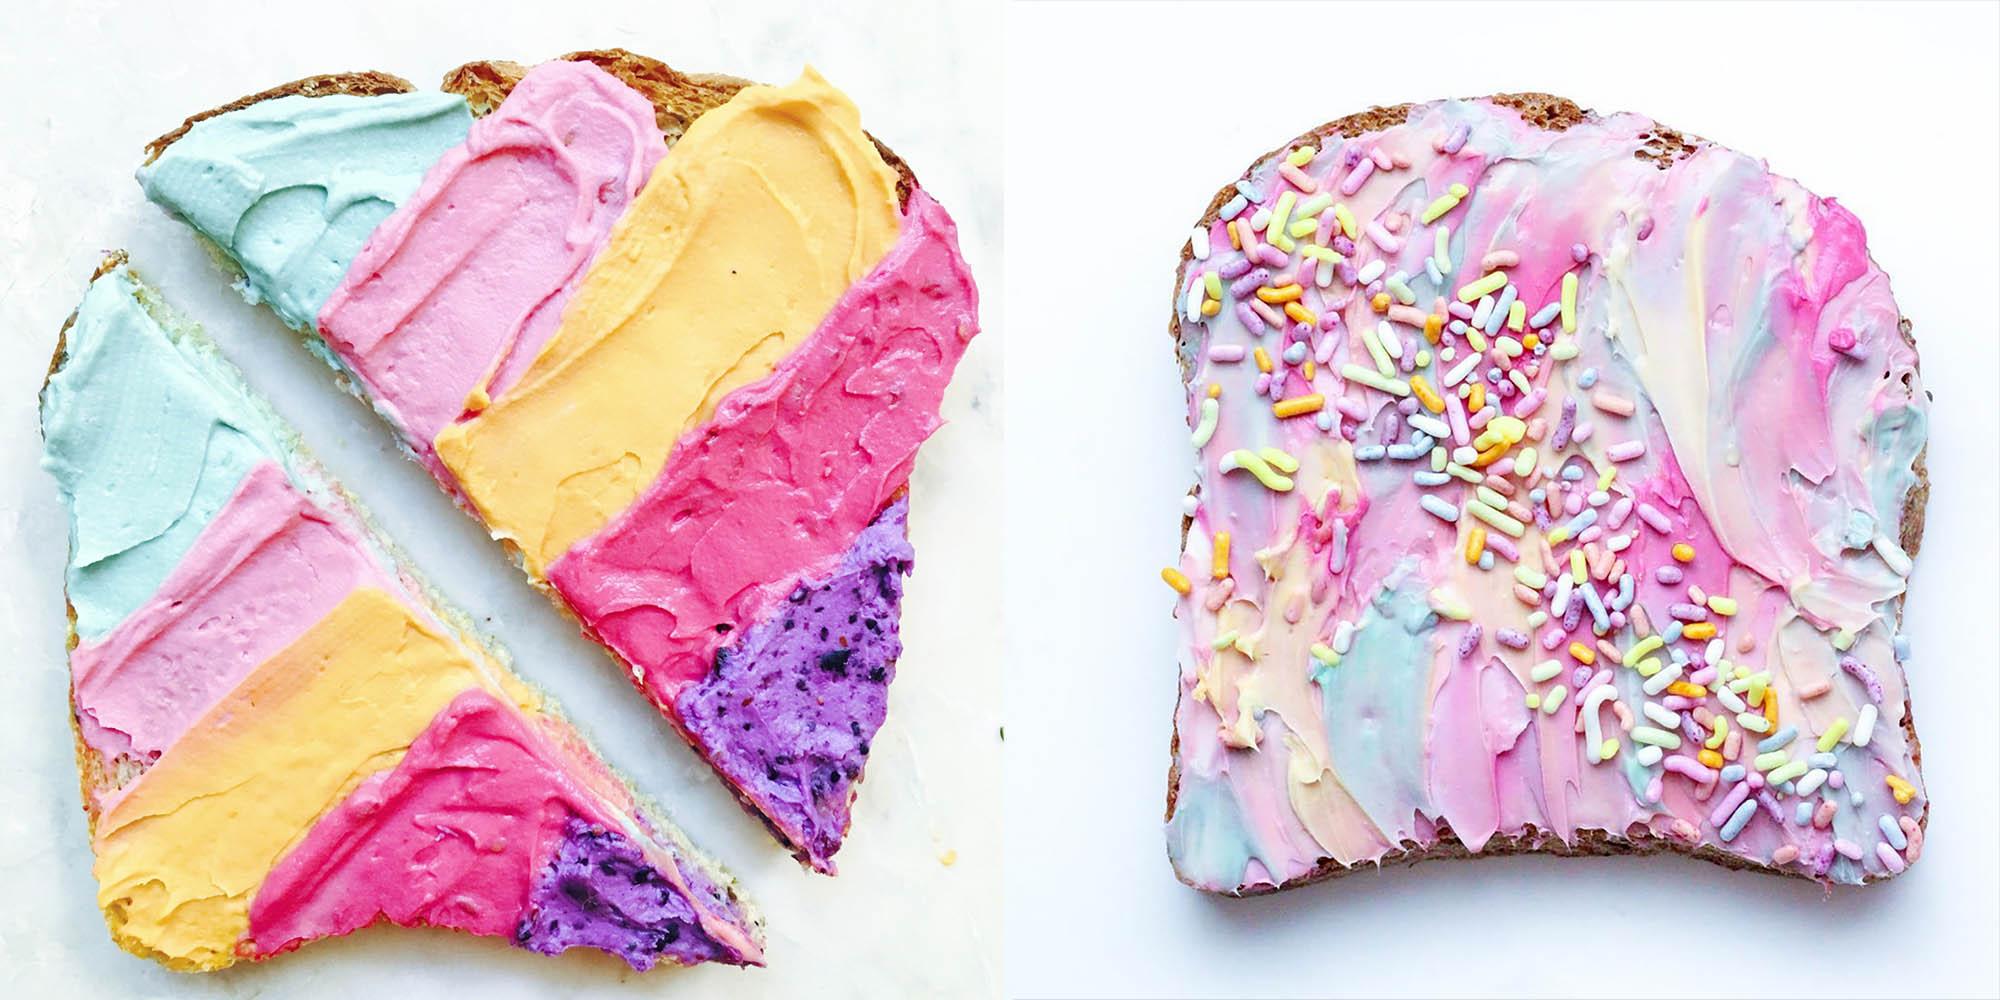 Is Unicorn Toast Healthy?